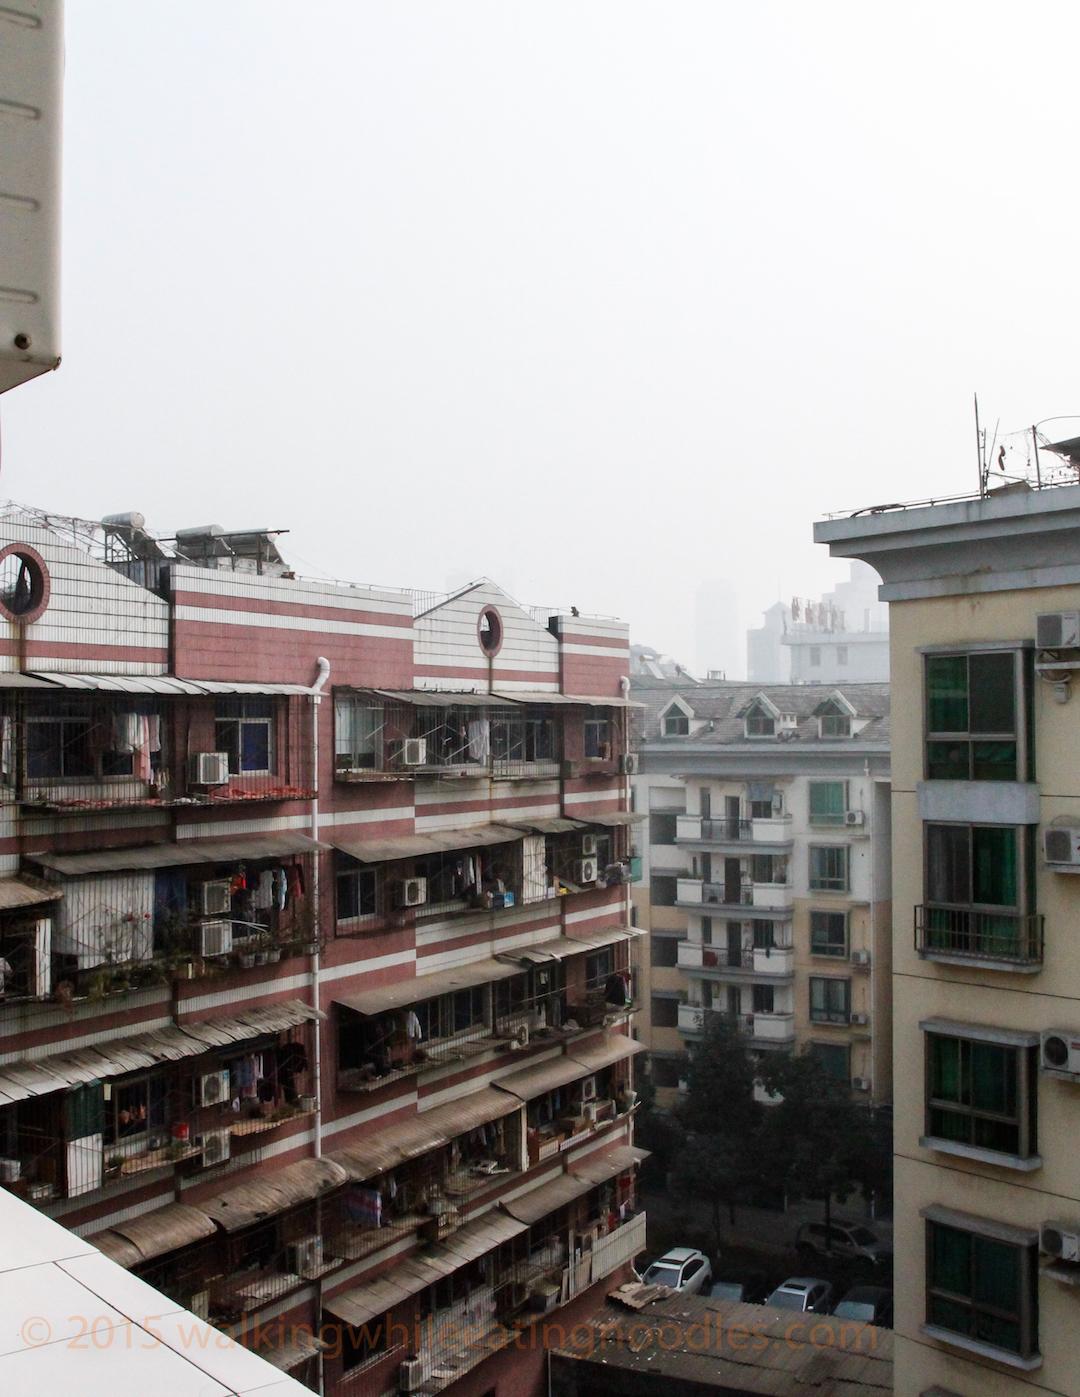 Milky Grey air from my balcony